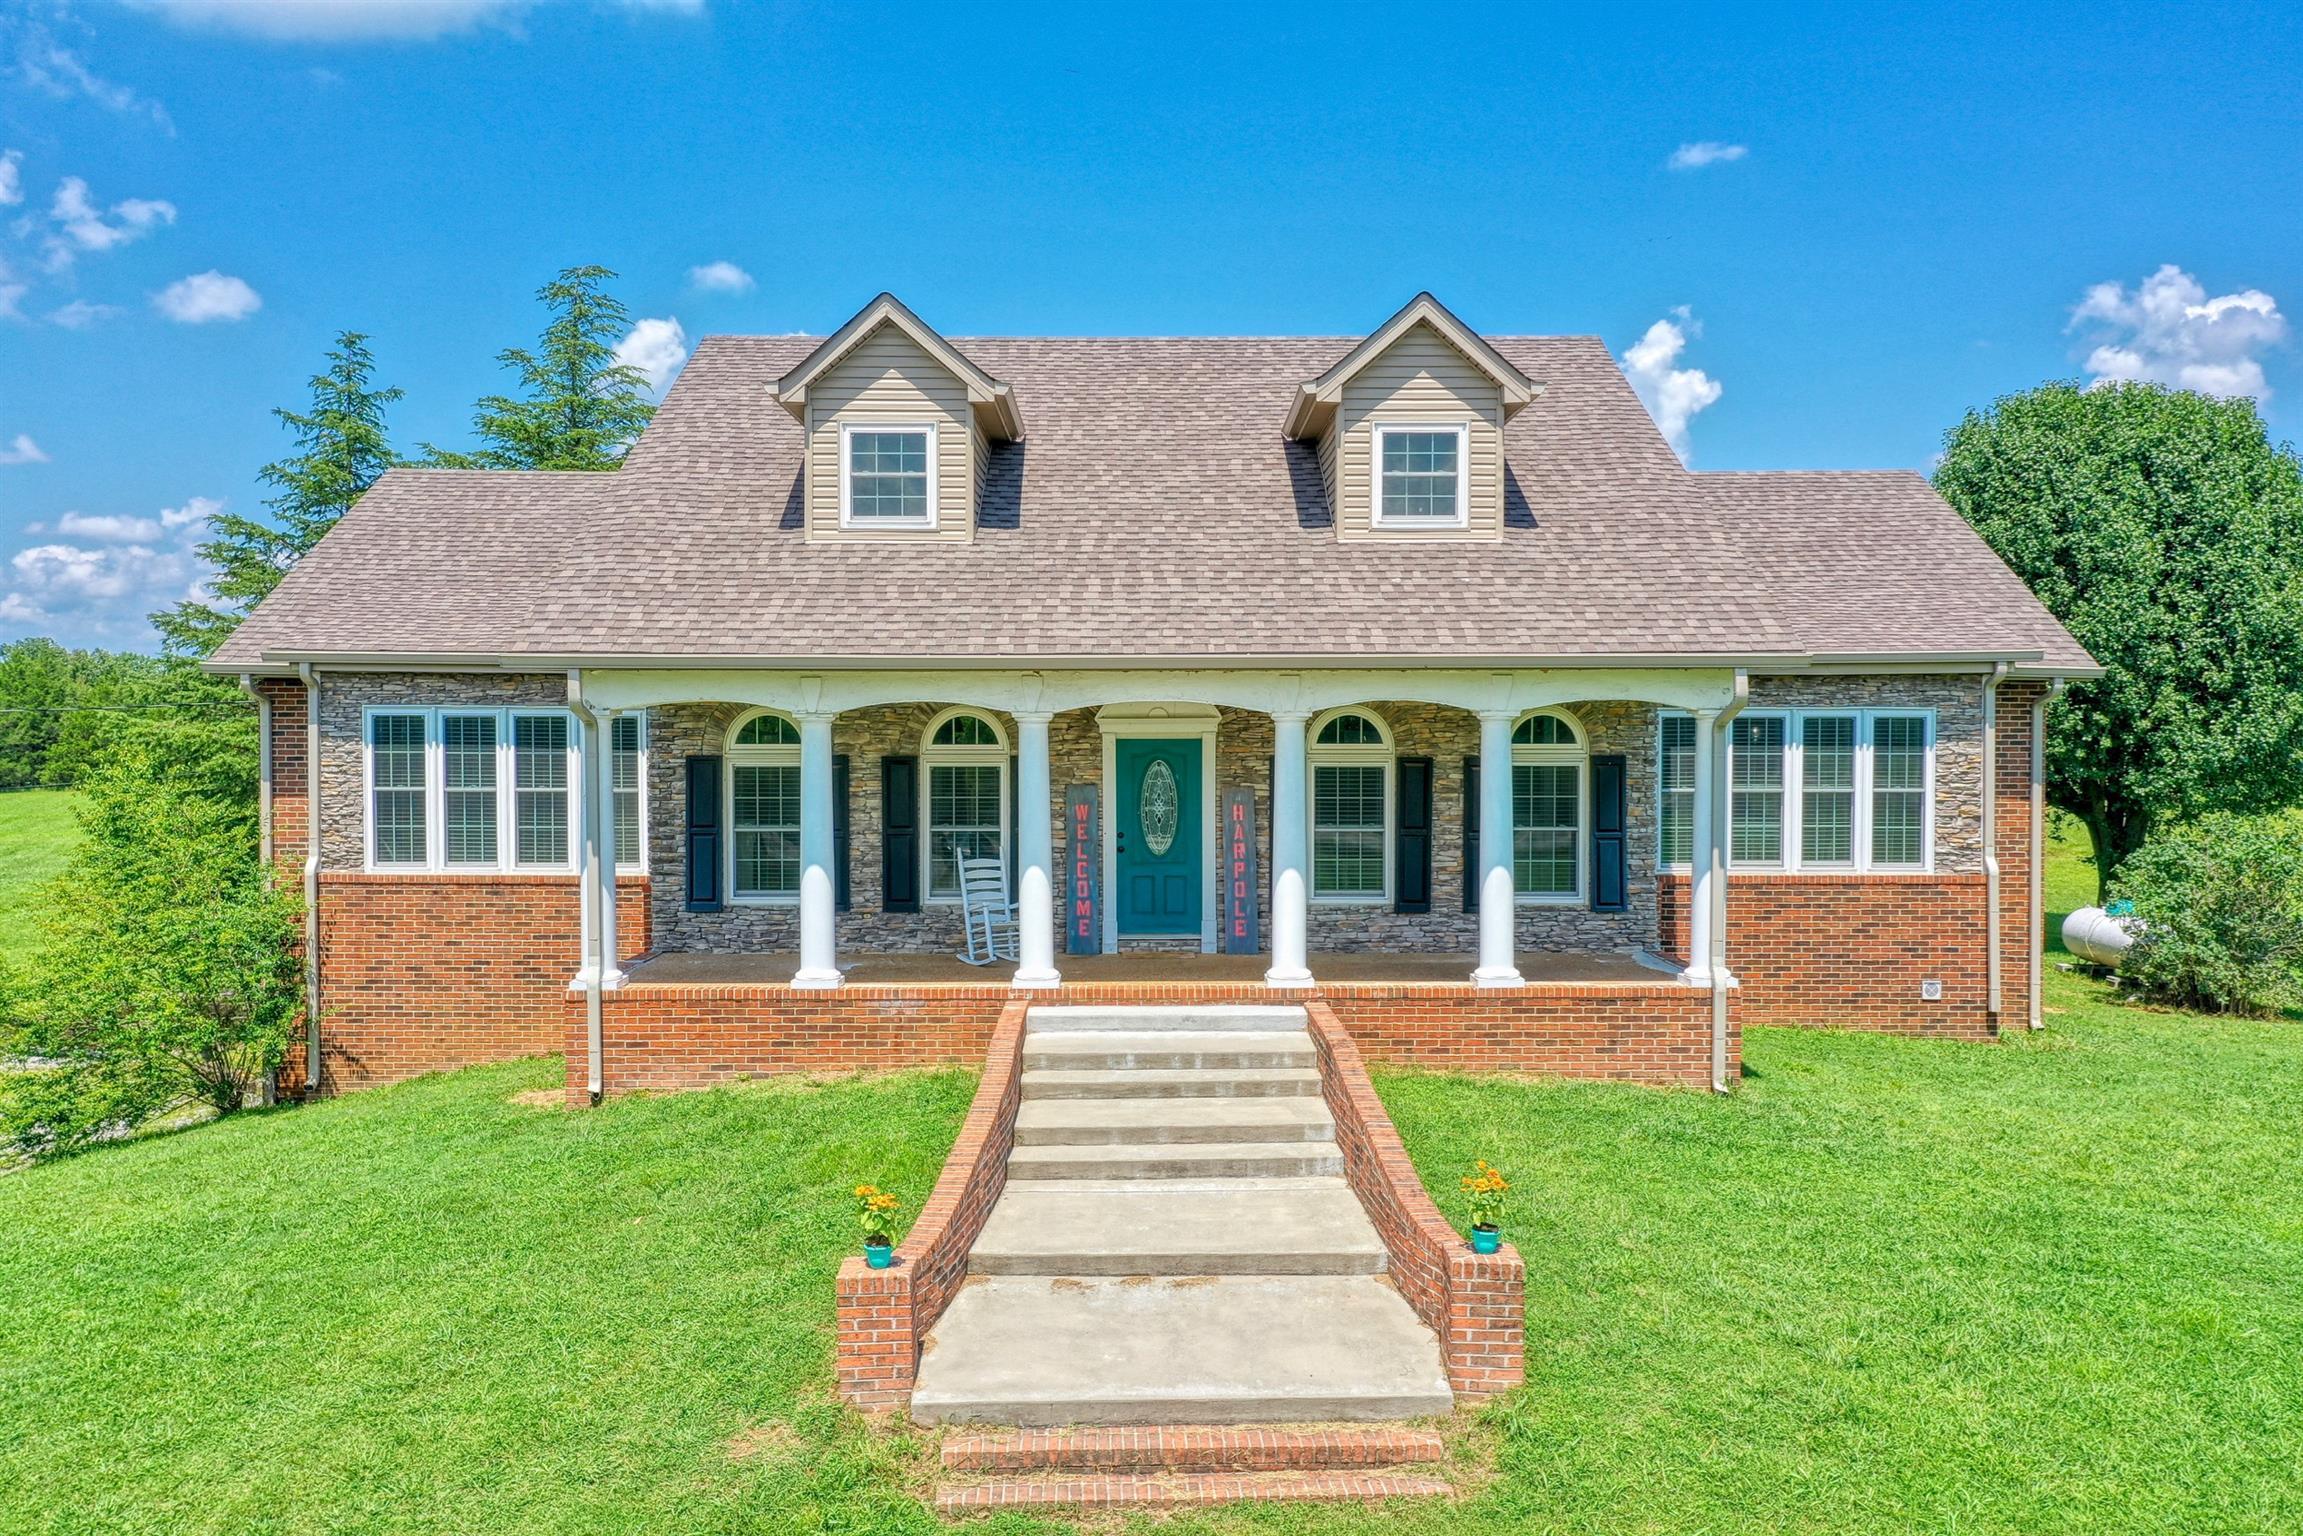 916 Old Columbia Rd, Unionville, TN 37180 - Unionville, TN real estate listing